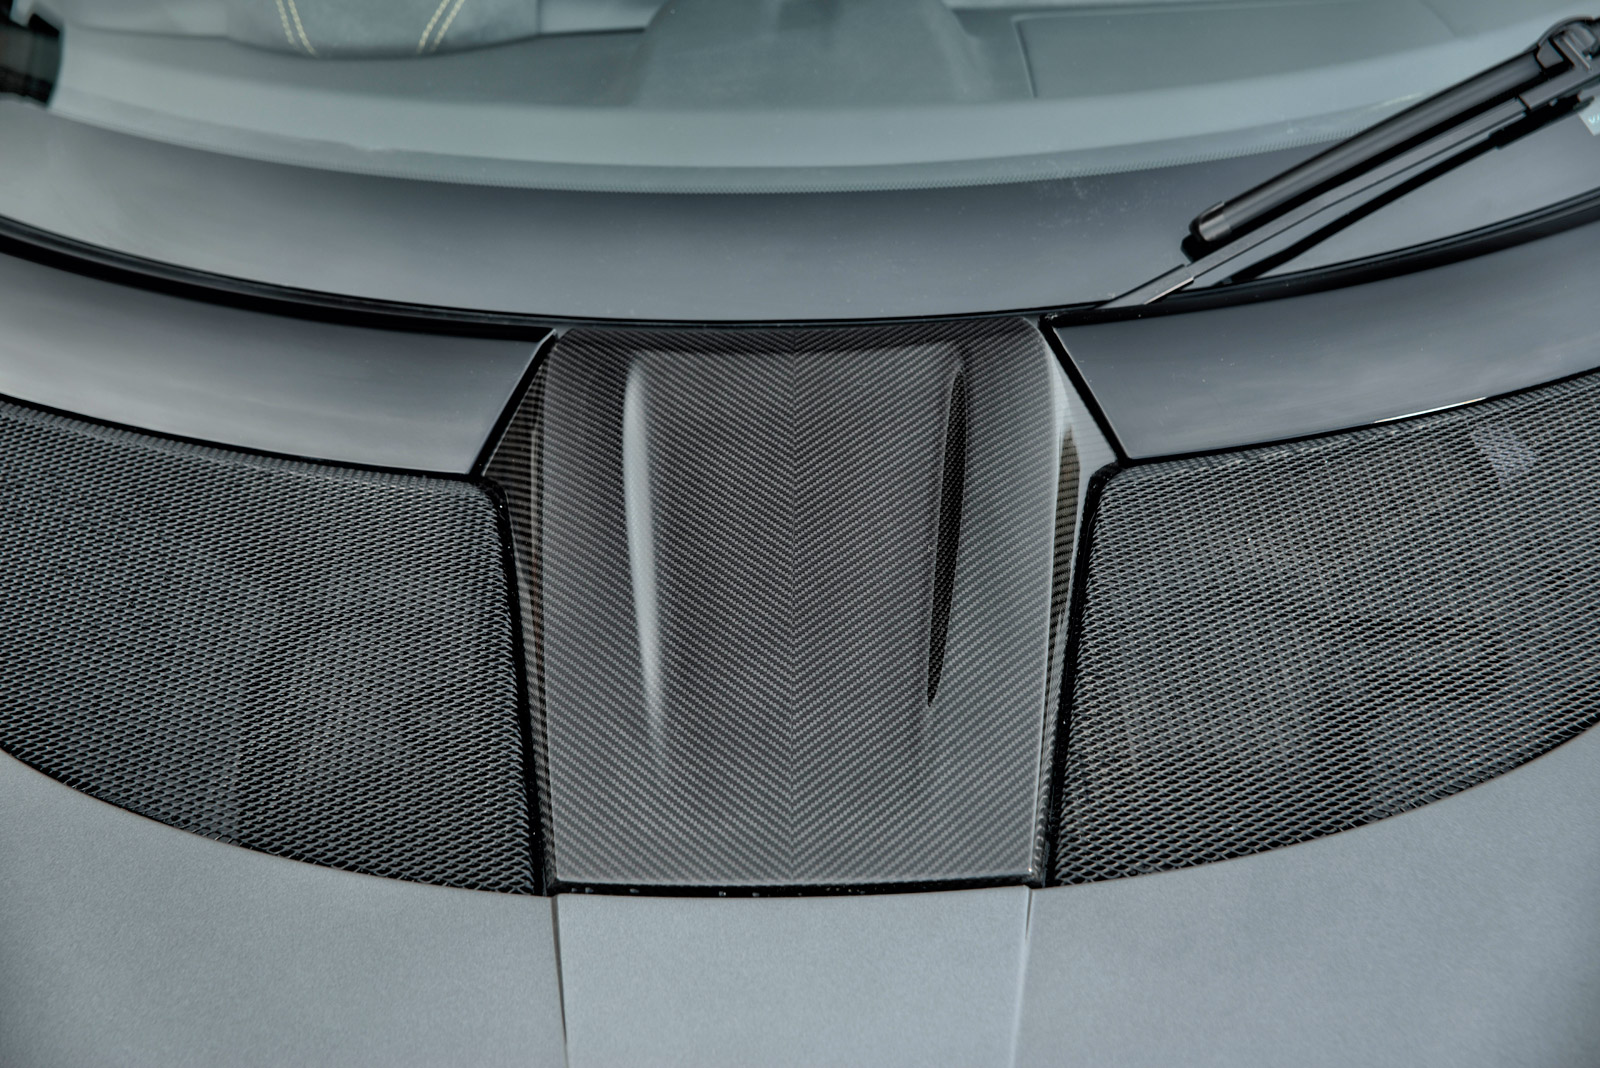 Luxury Cars: Limited Edition Lotus Evora Sport 410